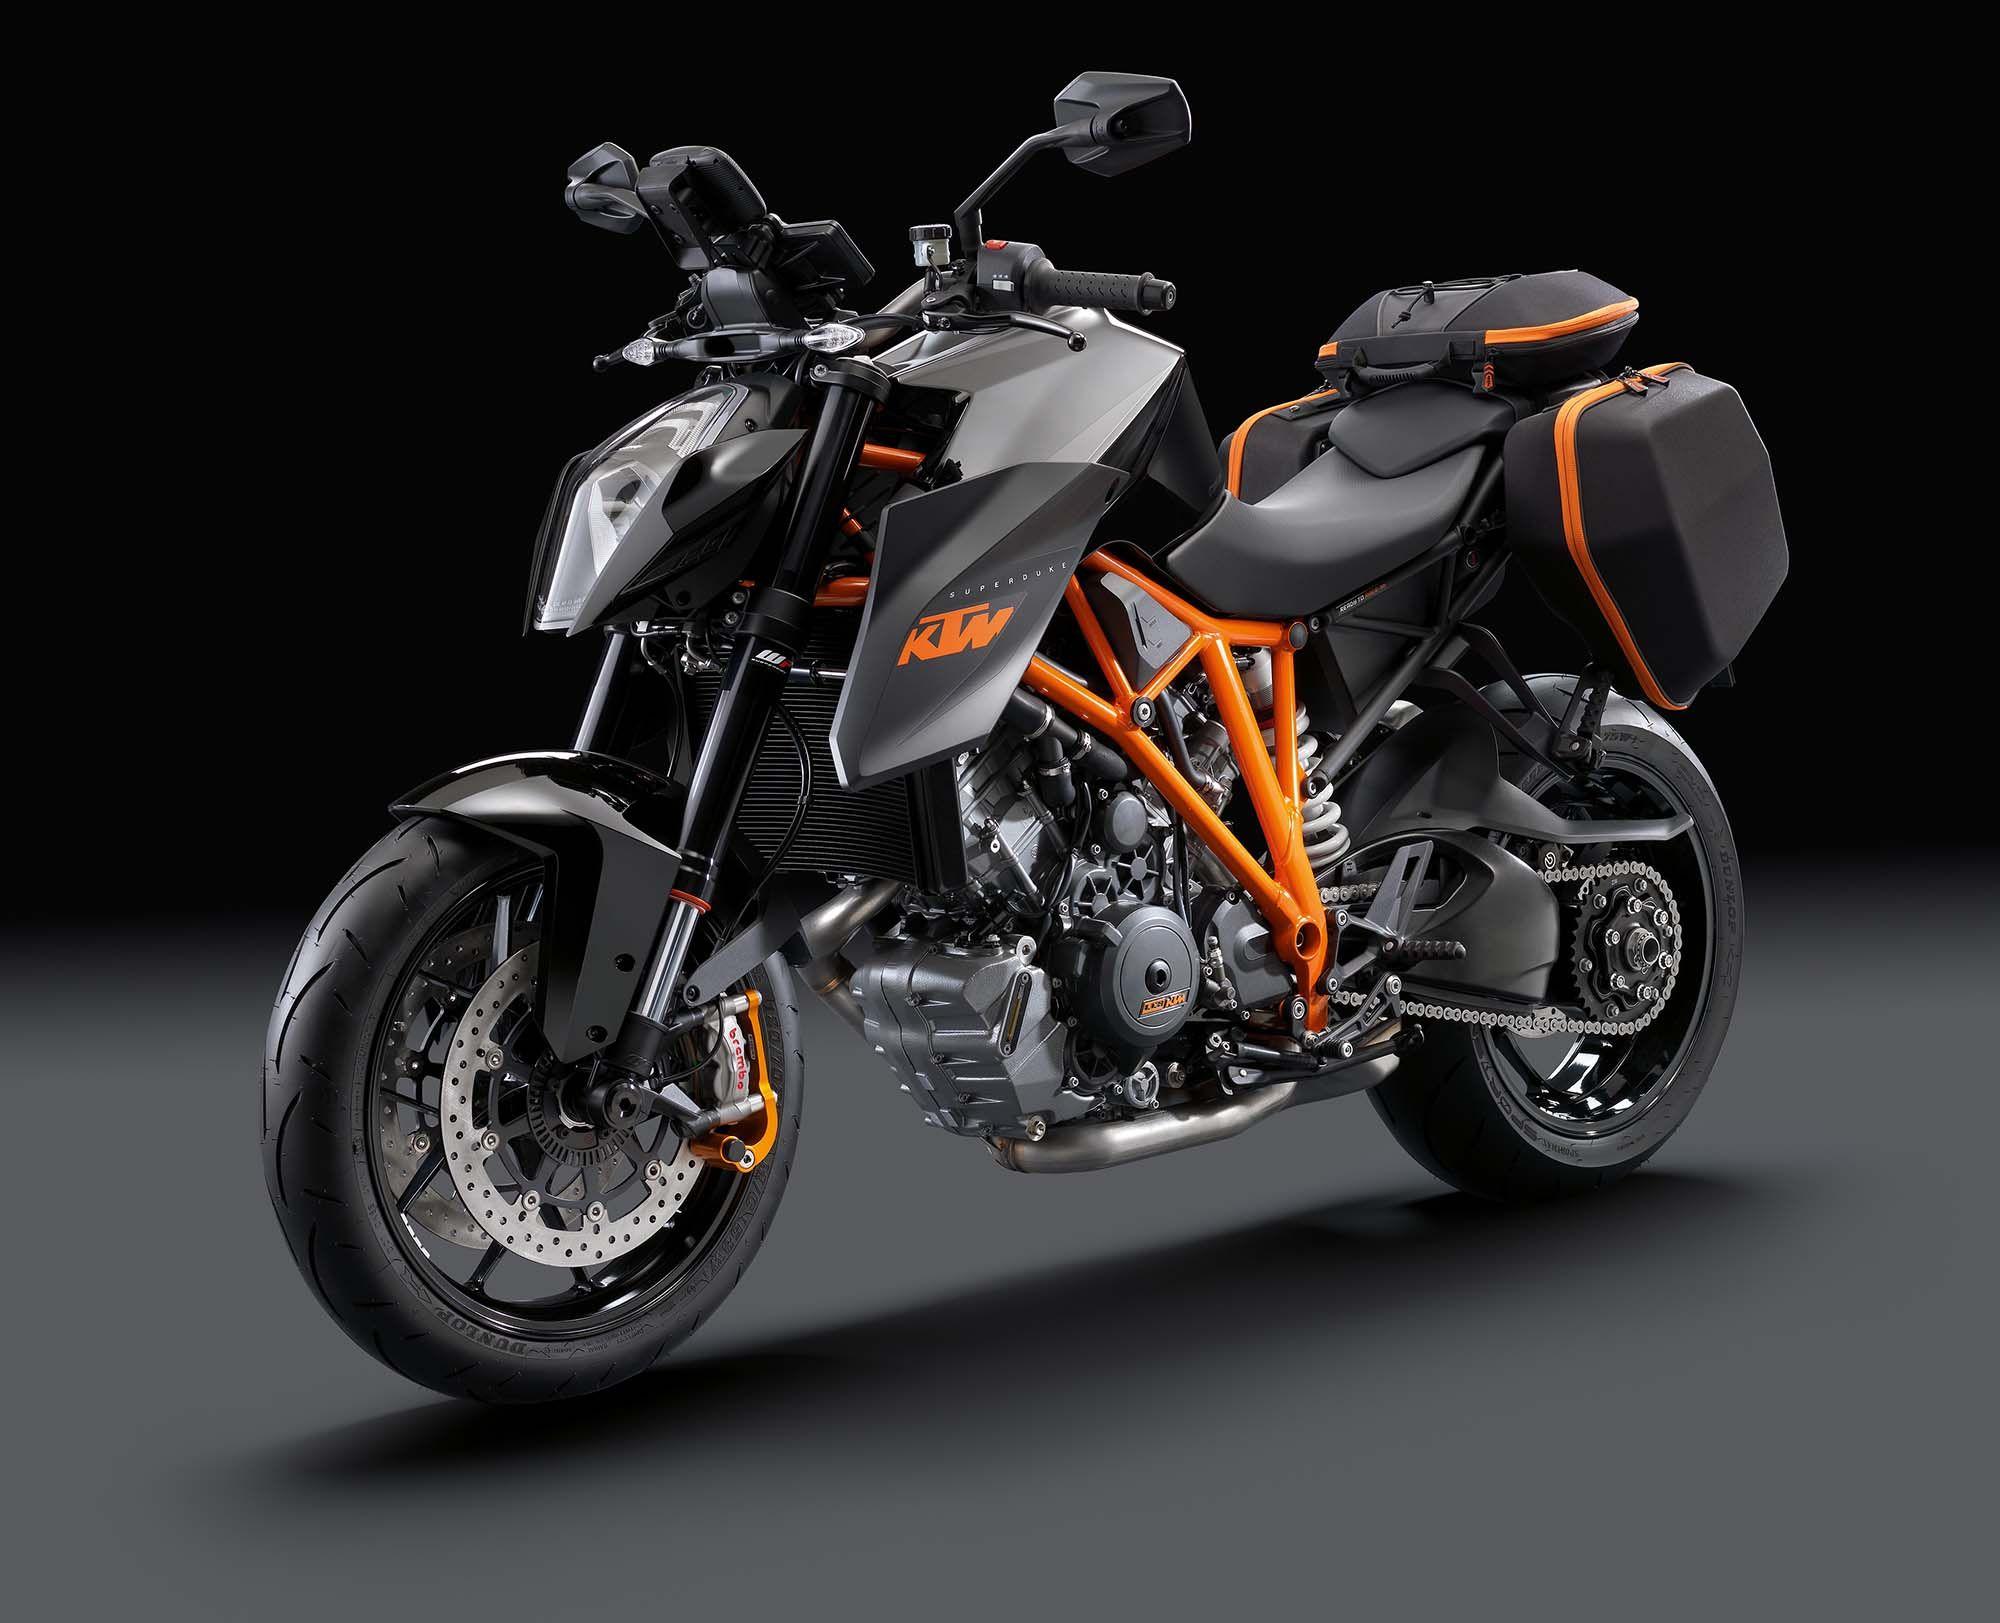 Ktm 1290 Super Duke R Ktm Motorcycle Bike Moto Bike